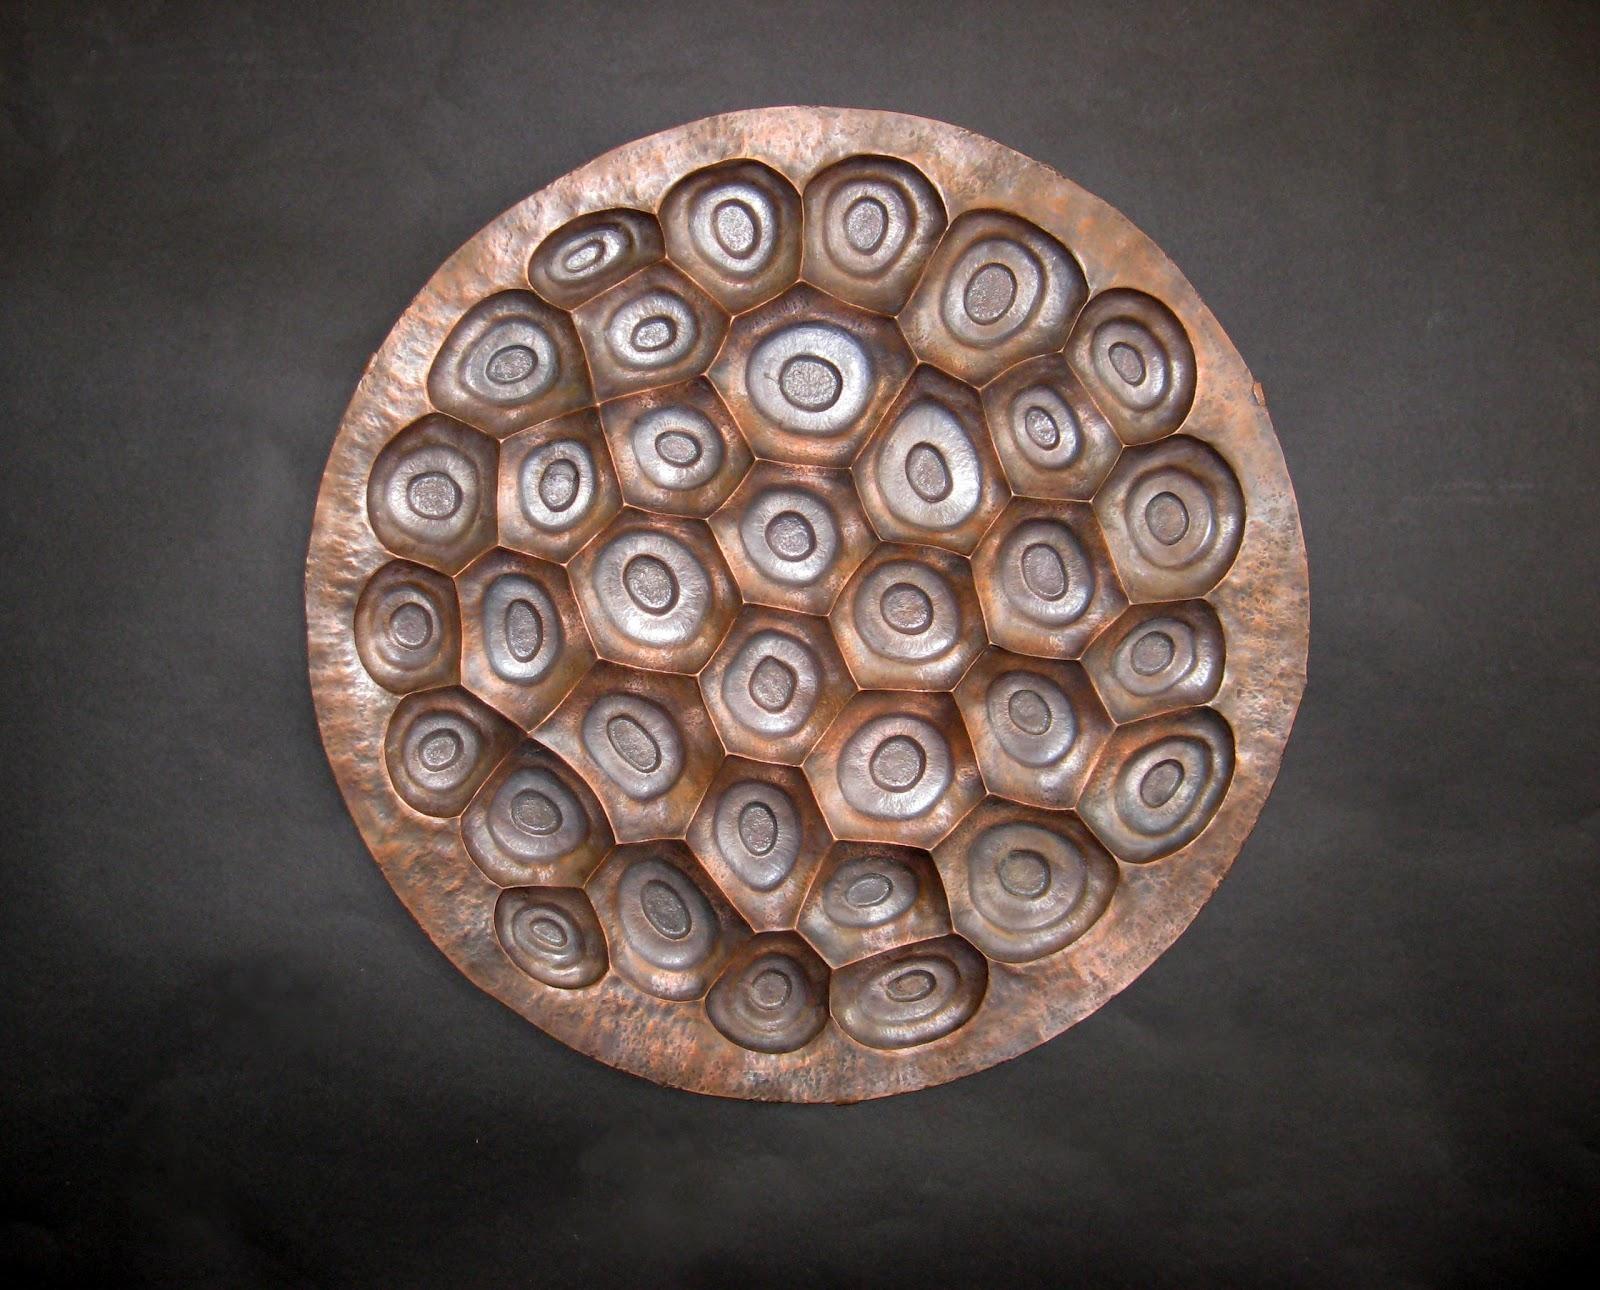 Metal Art And Sculpture: Images From Maronpot Studios Regarding Hammered Metal Wall Art (Image 8 of 20)